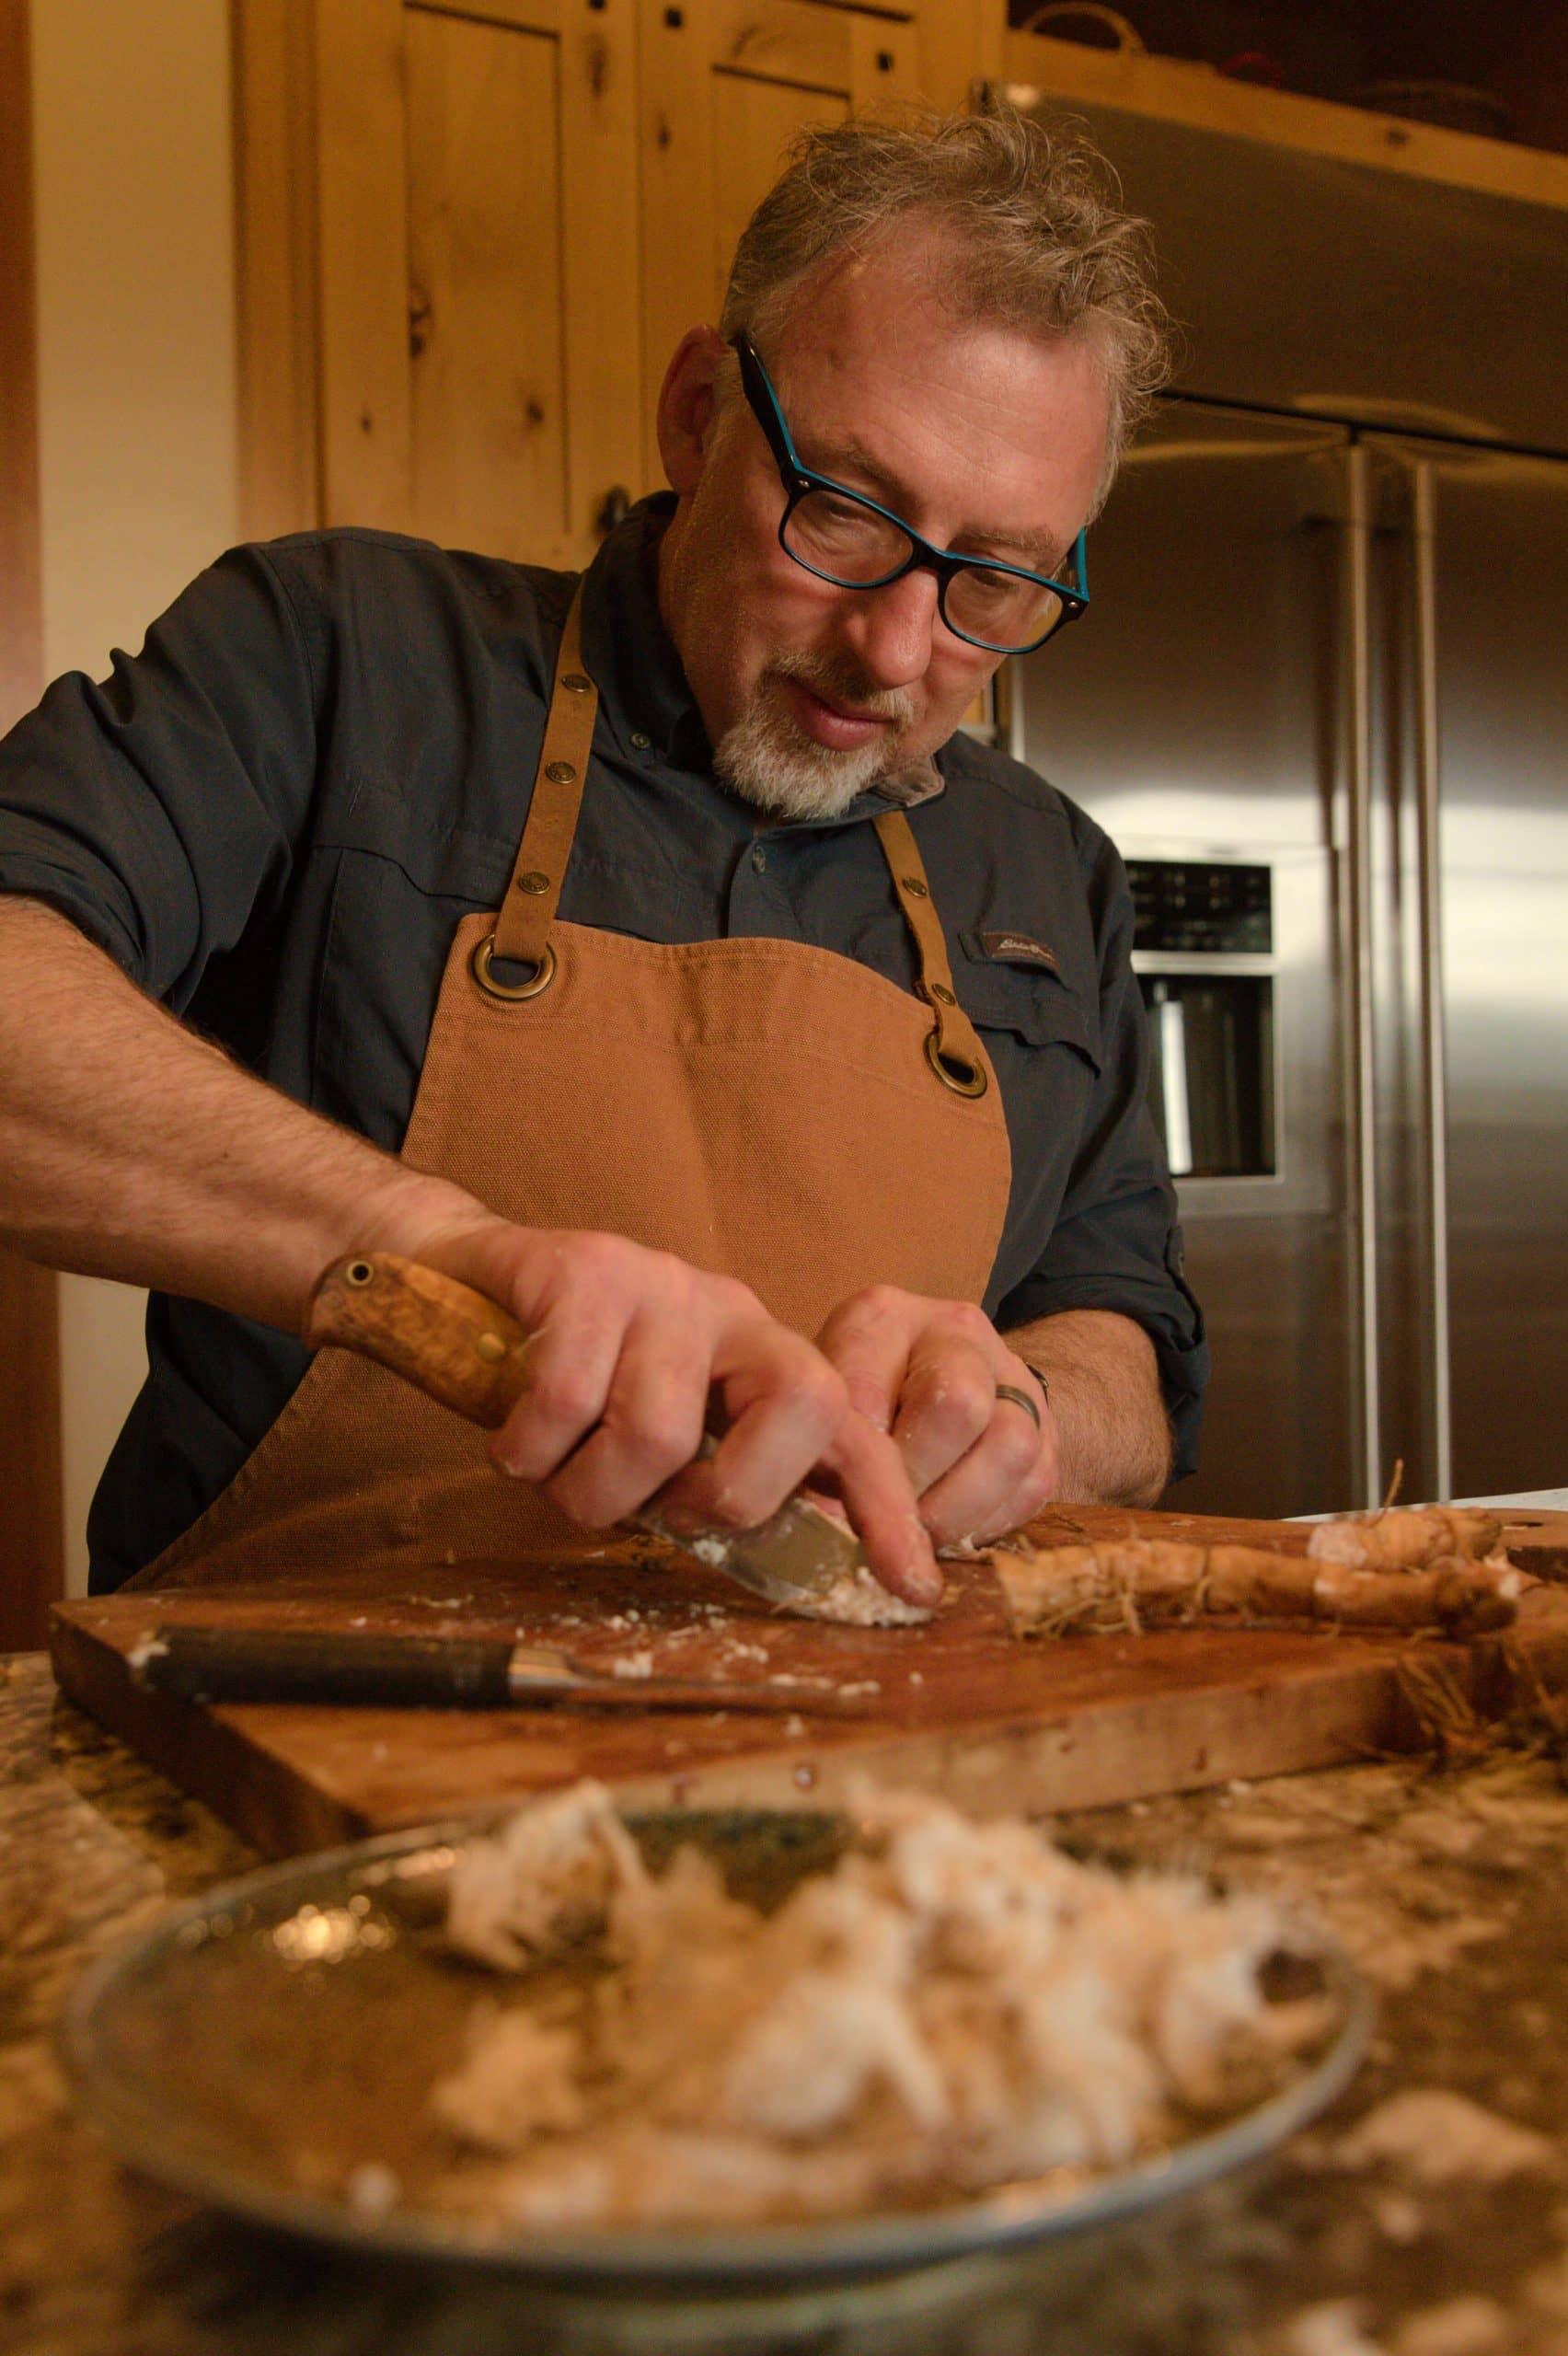 Chef Paul Rogalski in the kitchen